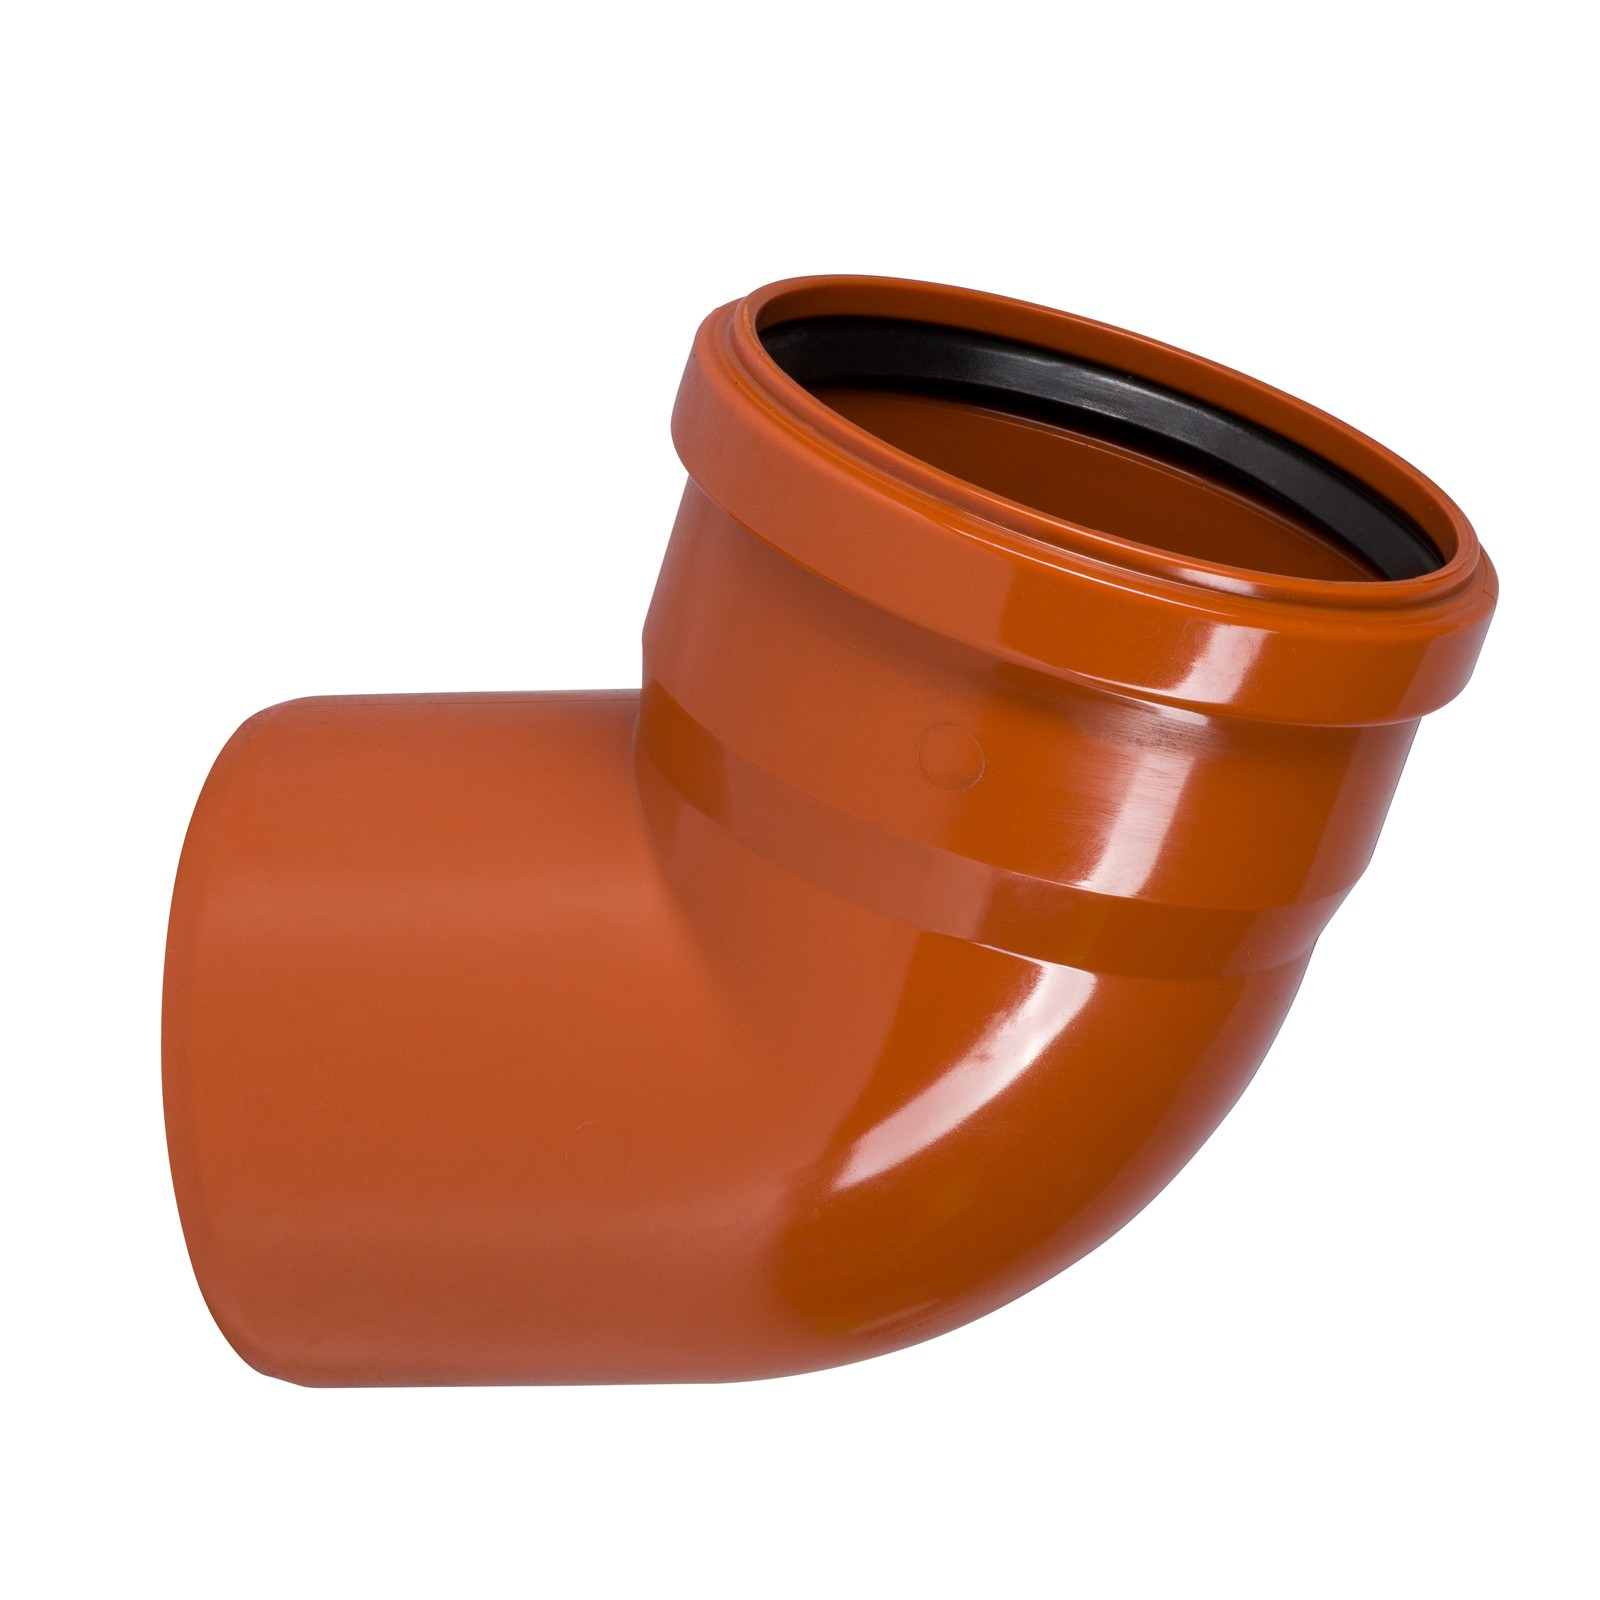 kg bogen dn110 67 grad rohr 100 mm abwasserrohr orange. Black Bedroom Furniture Sets. Home Design Ideas